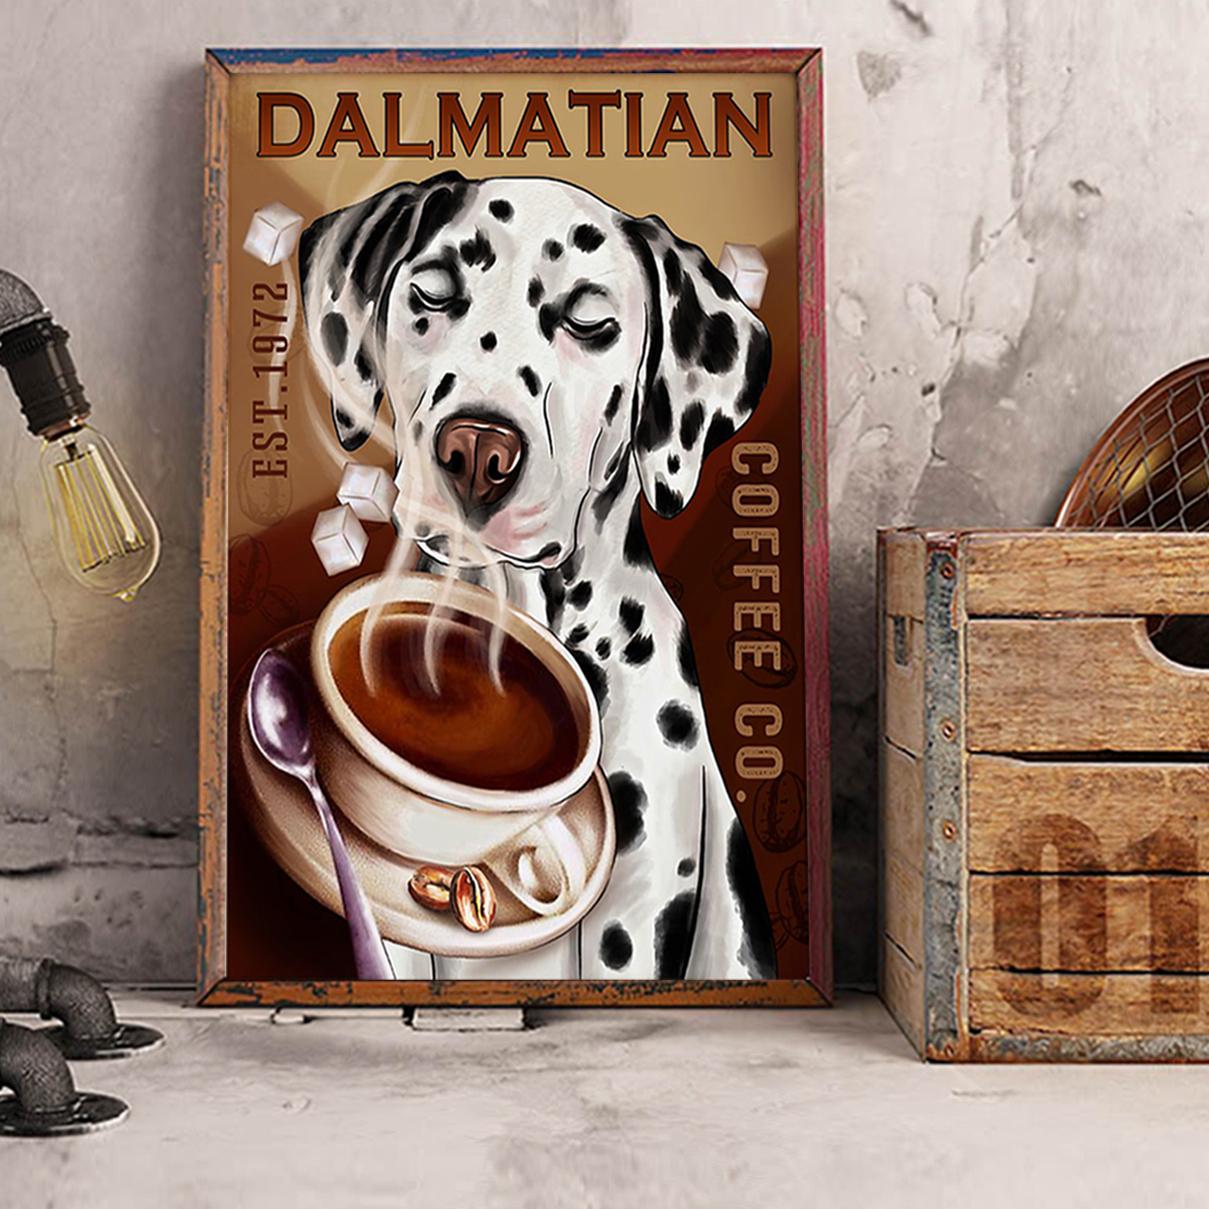 Dalmatian coffee poster A3